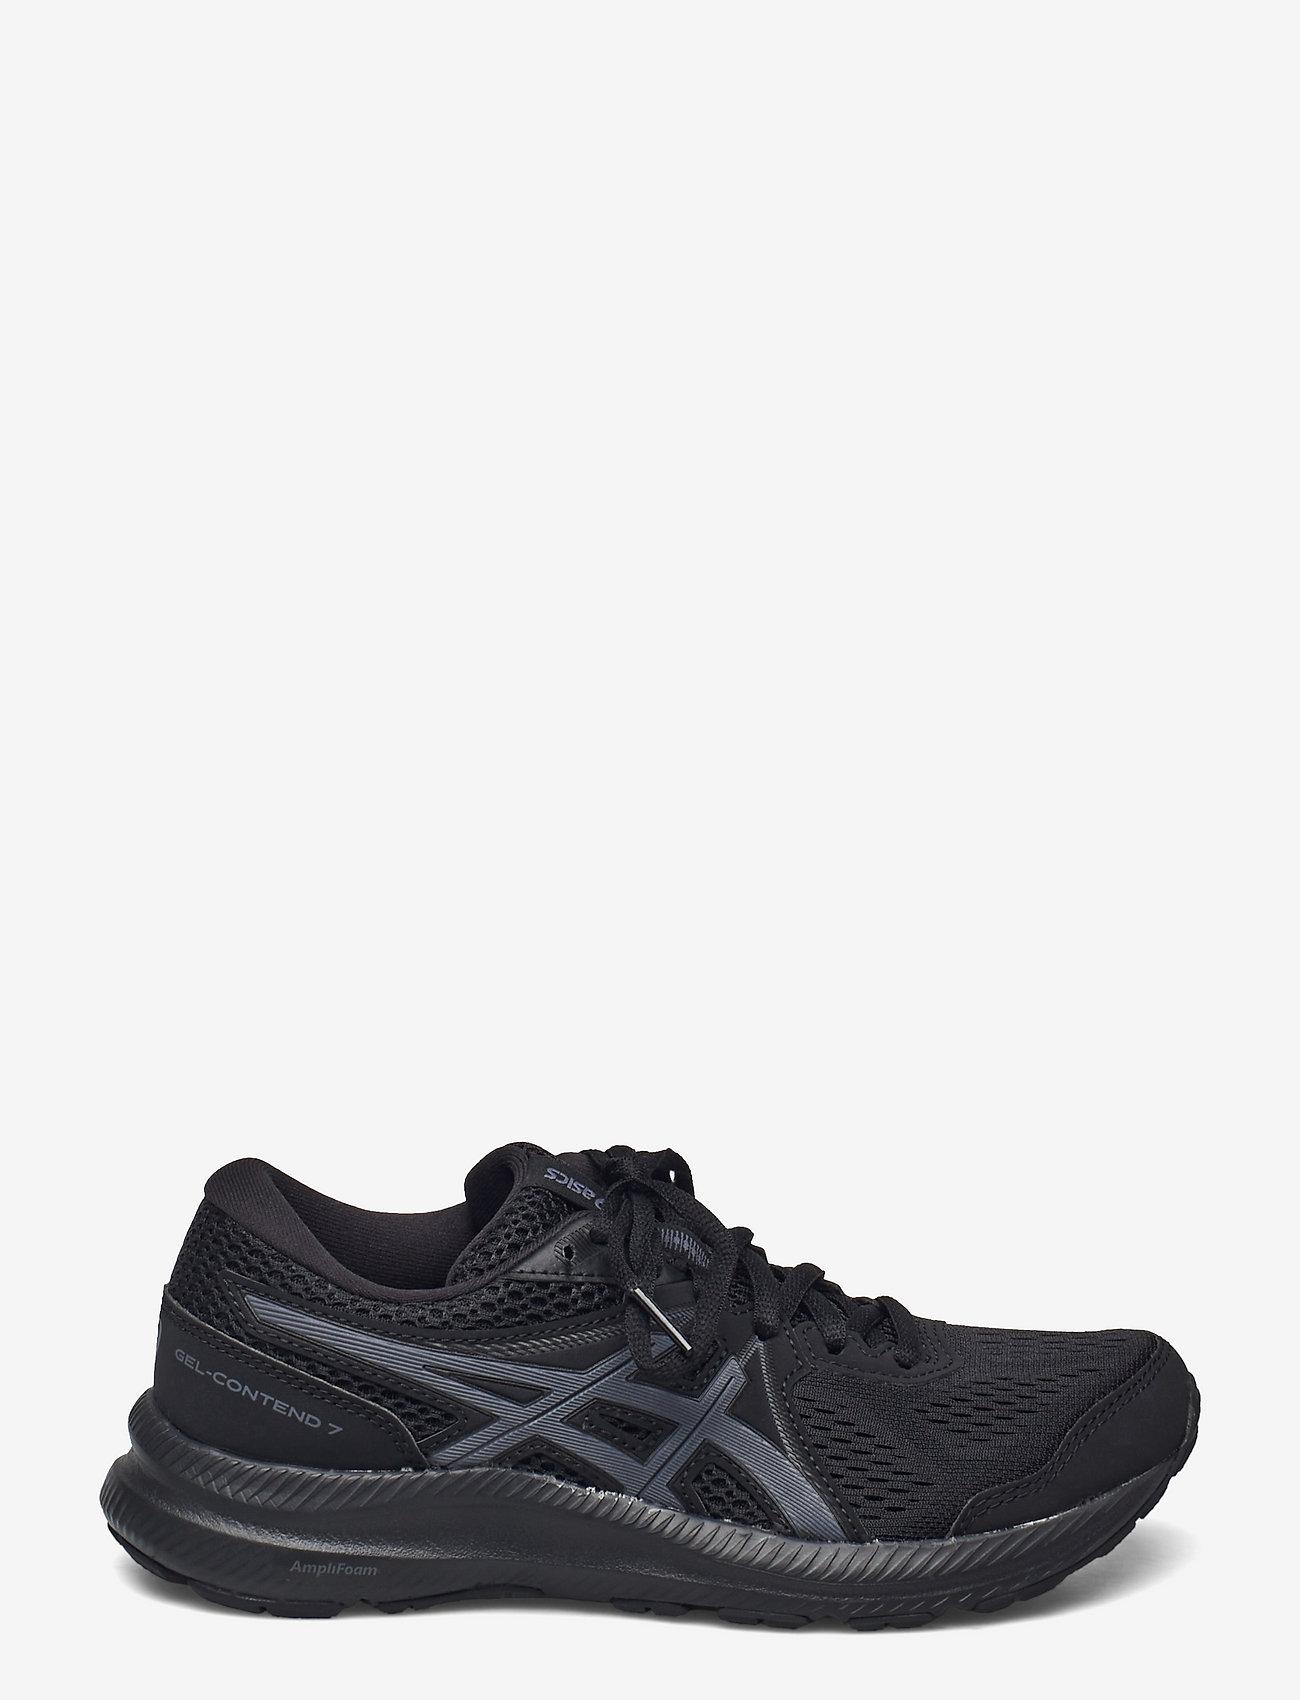 Asics - GEL-CONTEND 7 - running shoes - black/carrier grey - 1